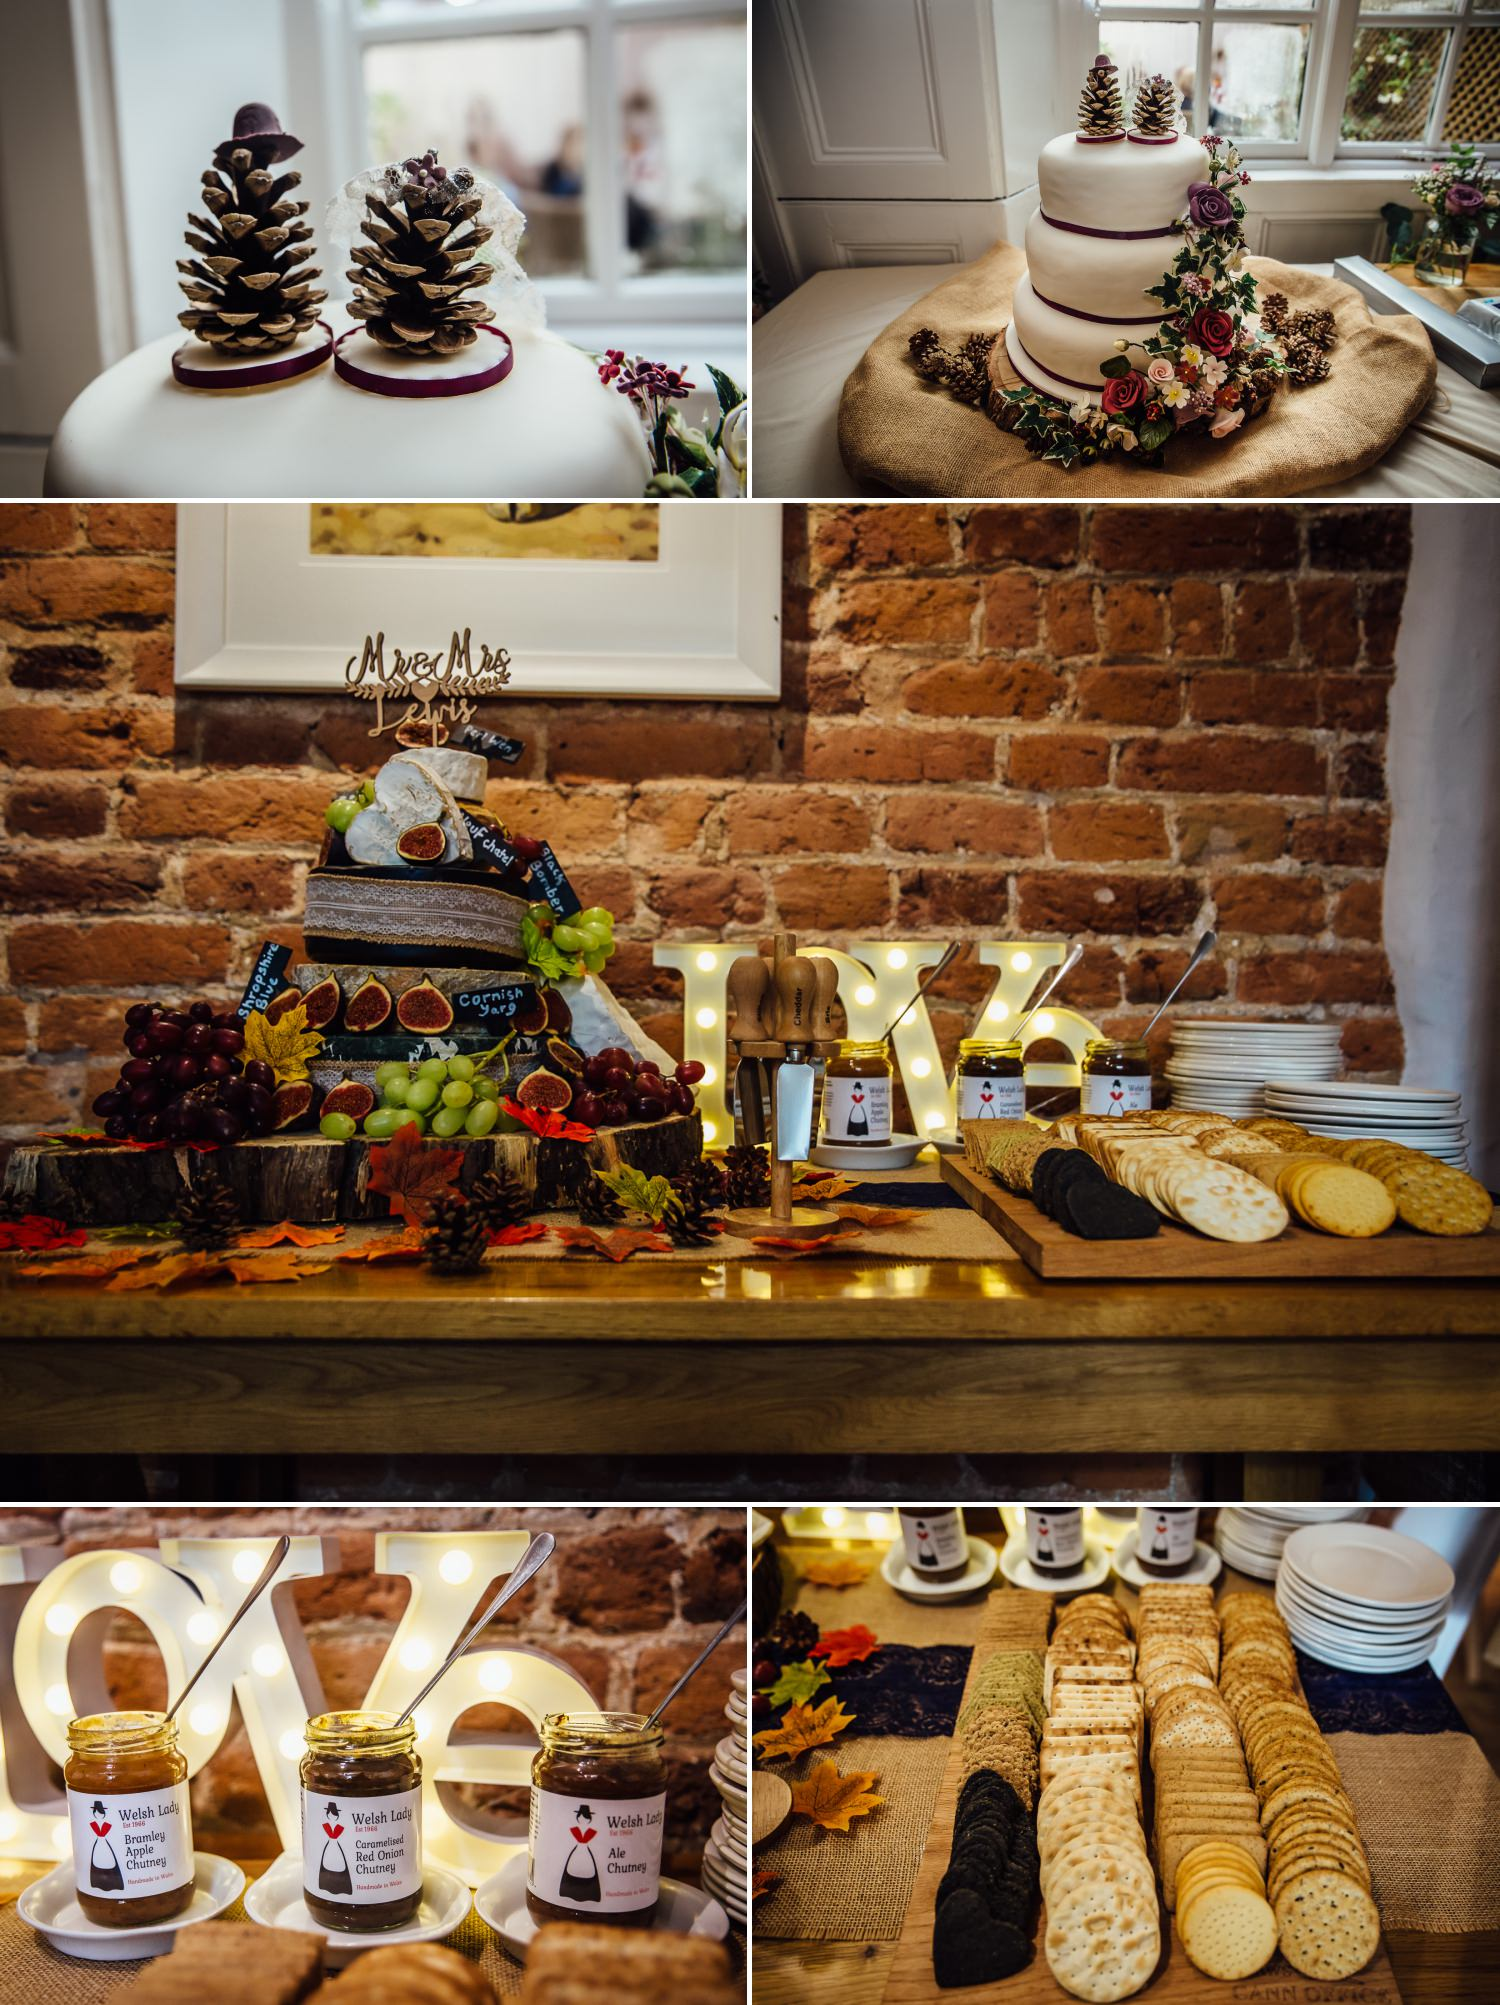 wedding photography of cheese cake and wedding cake